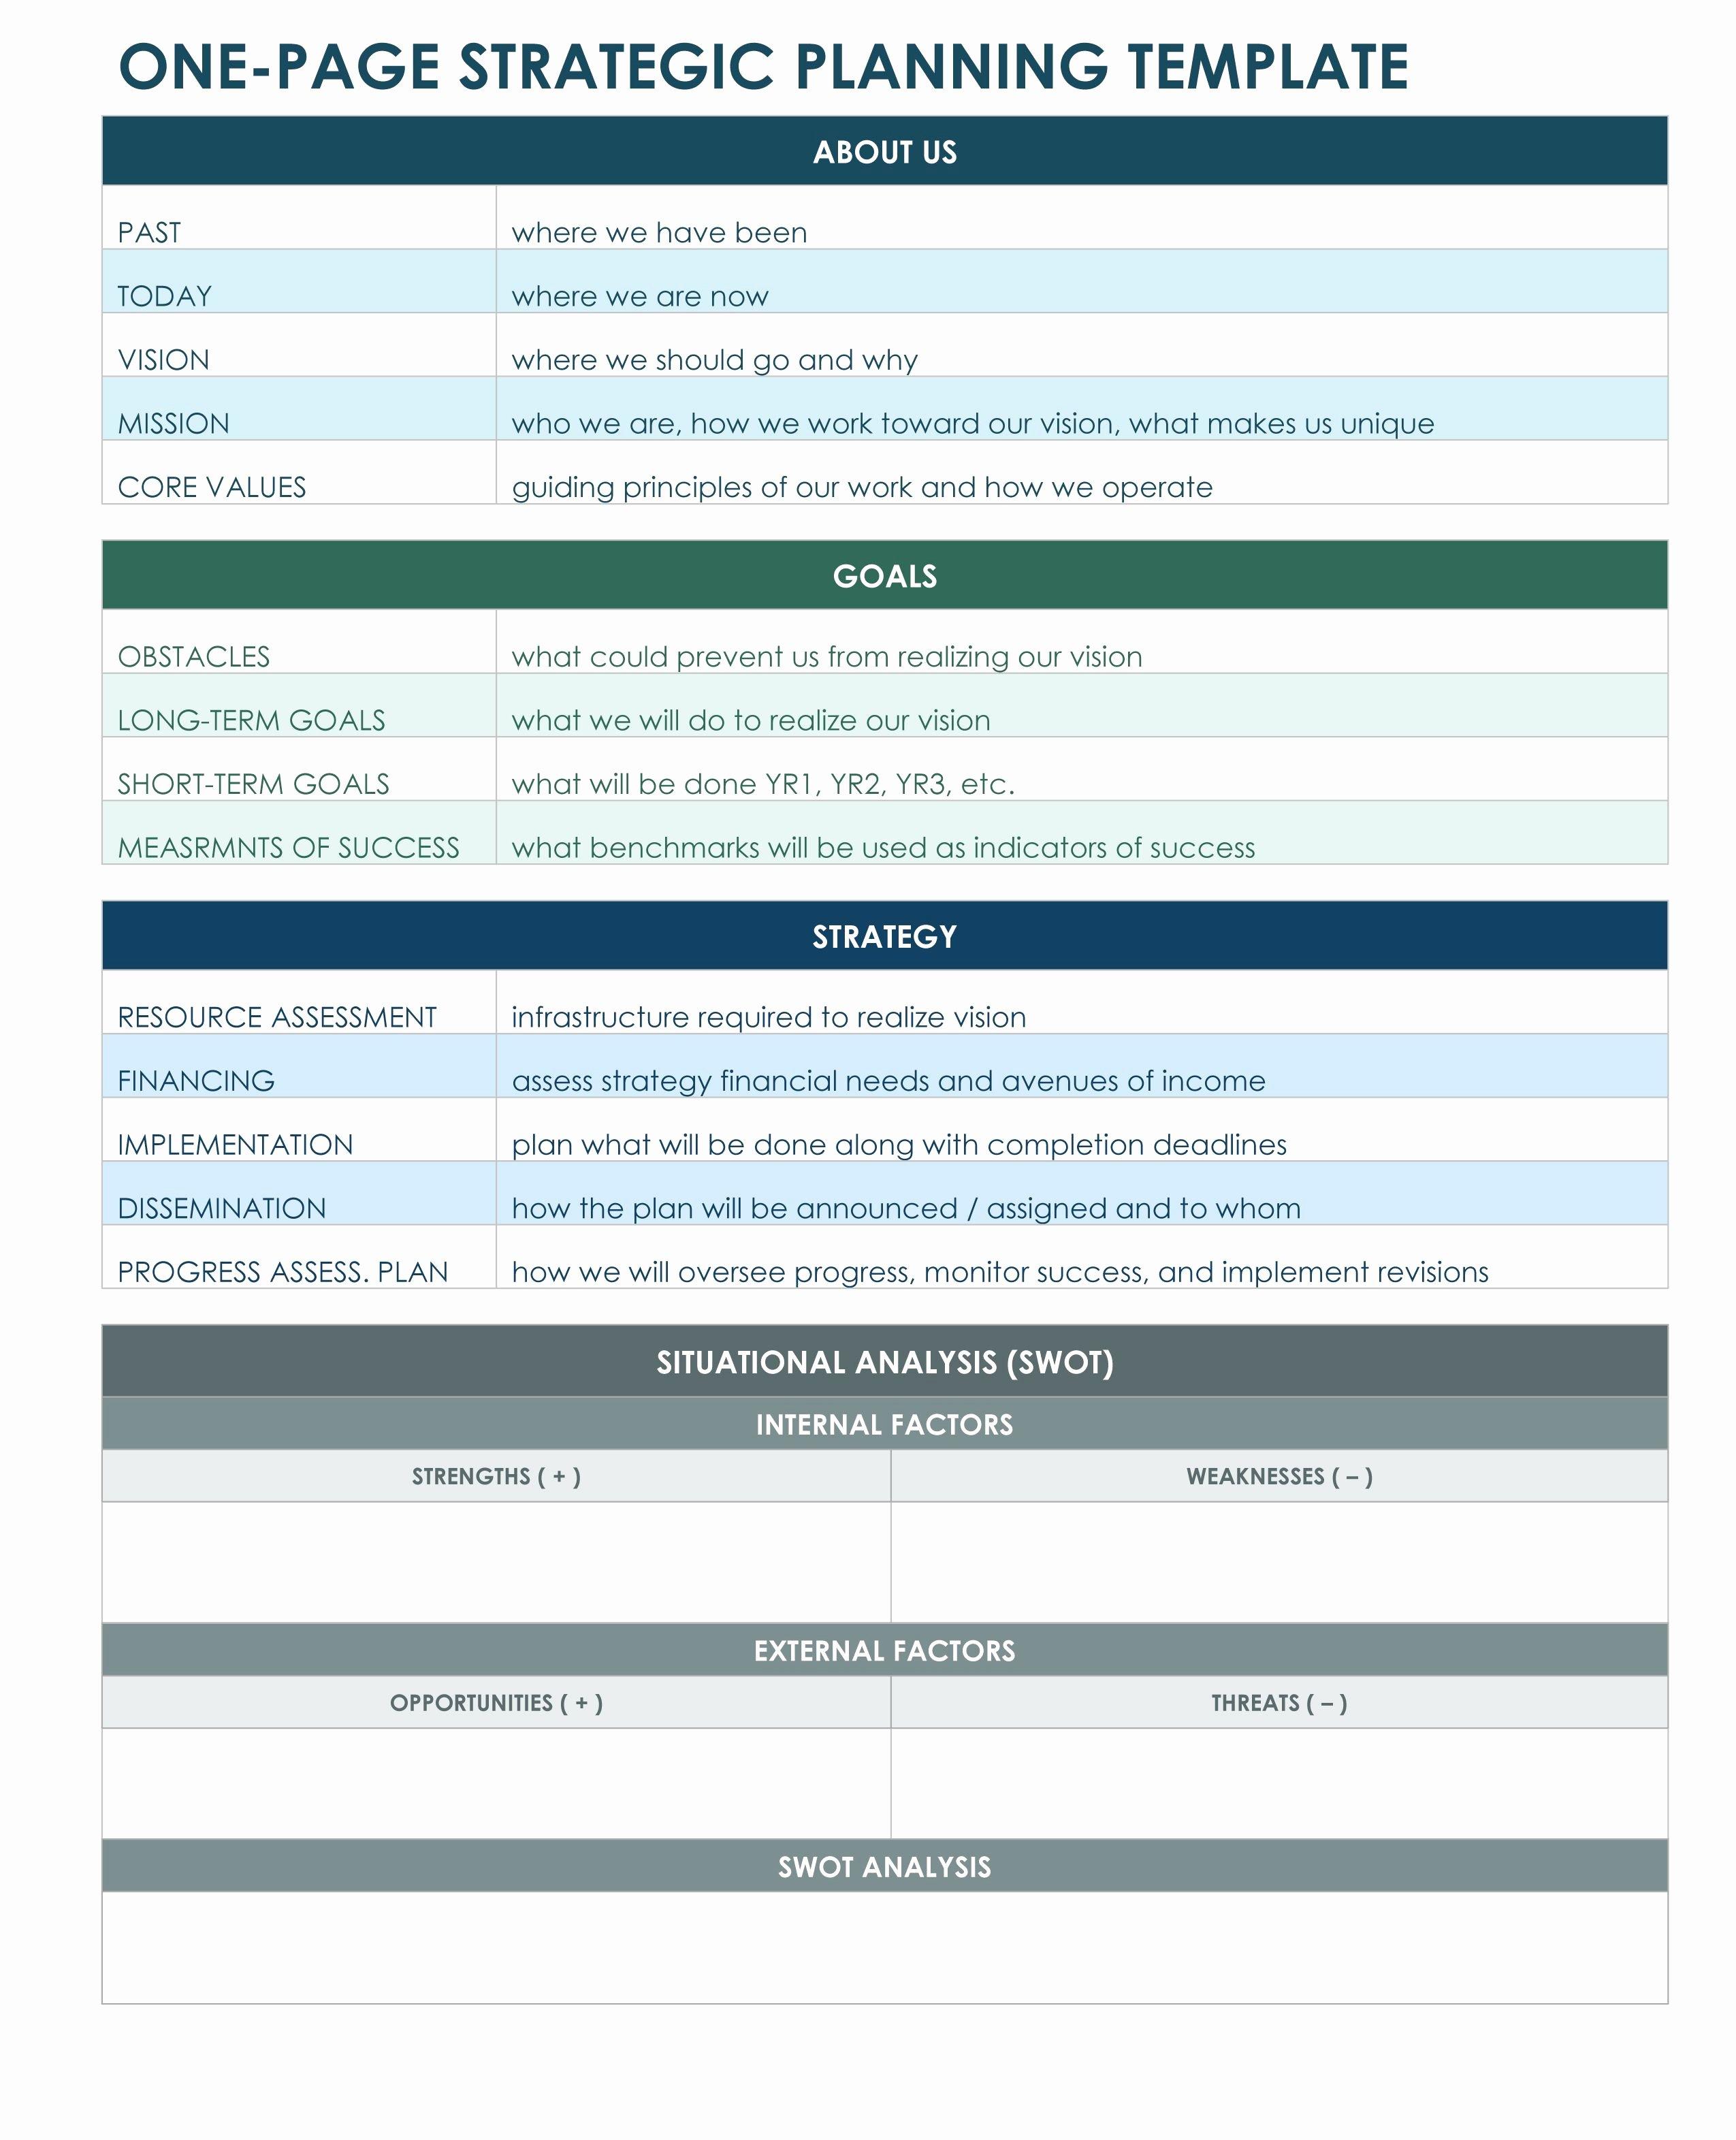 Strategic Plan Template Excel Unique One Page Strategic Plan Excel Template